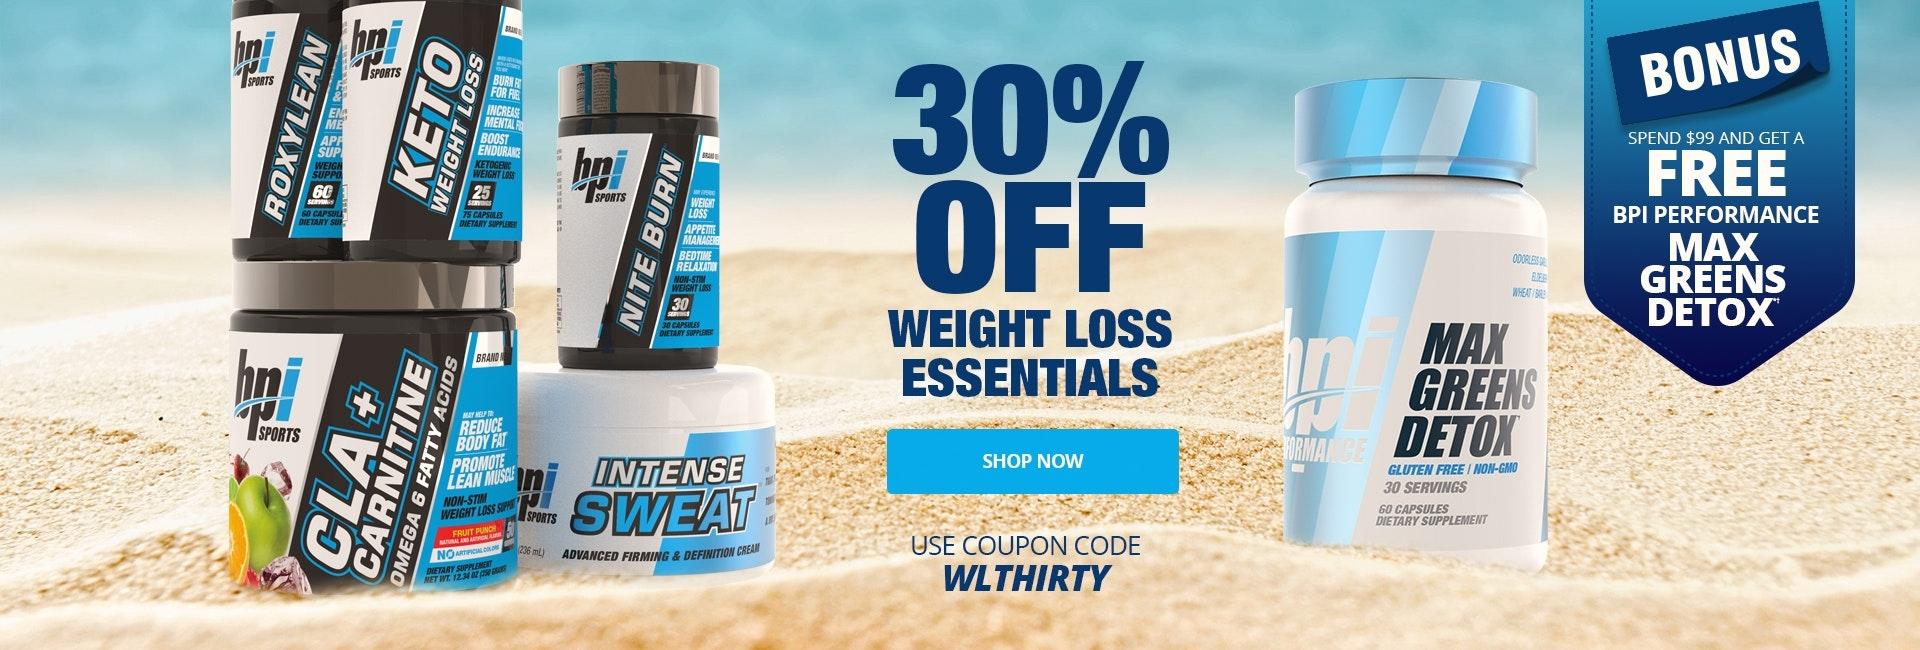 30 Off All Weight Loss Essentials Free Max Greens Detox 1920x650 HP DESK